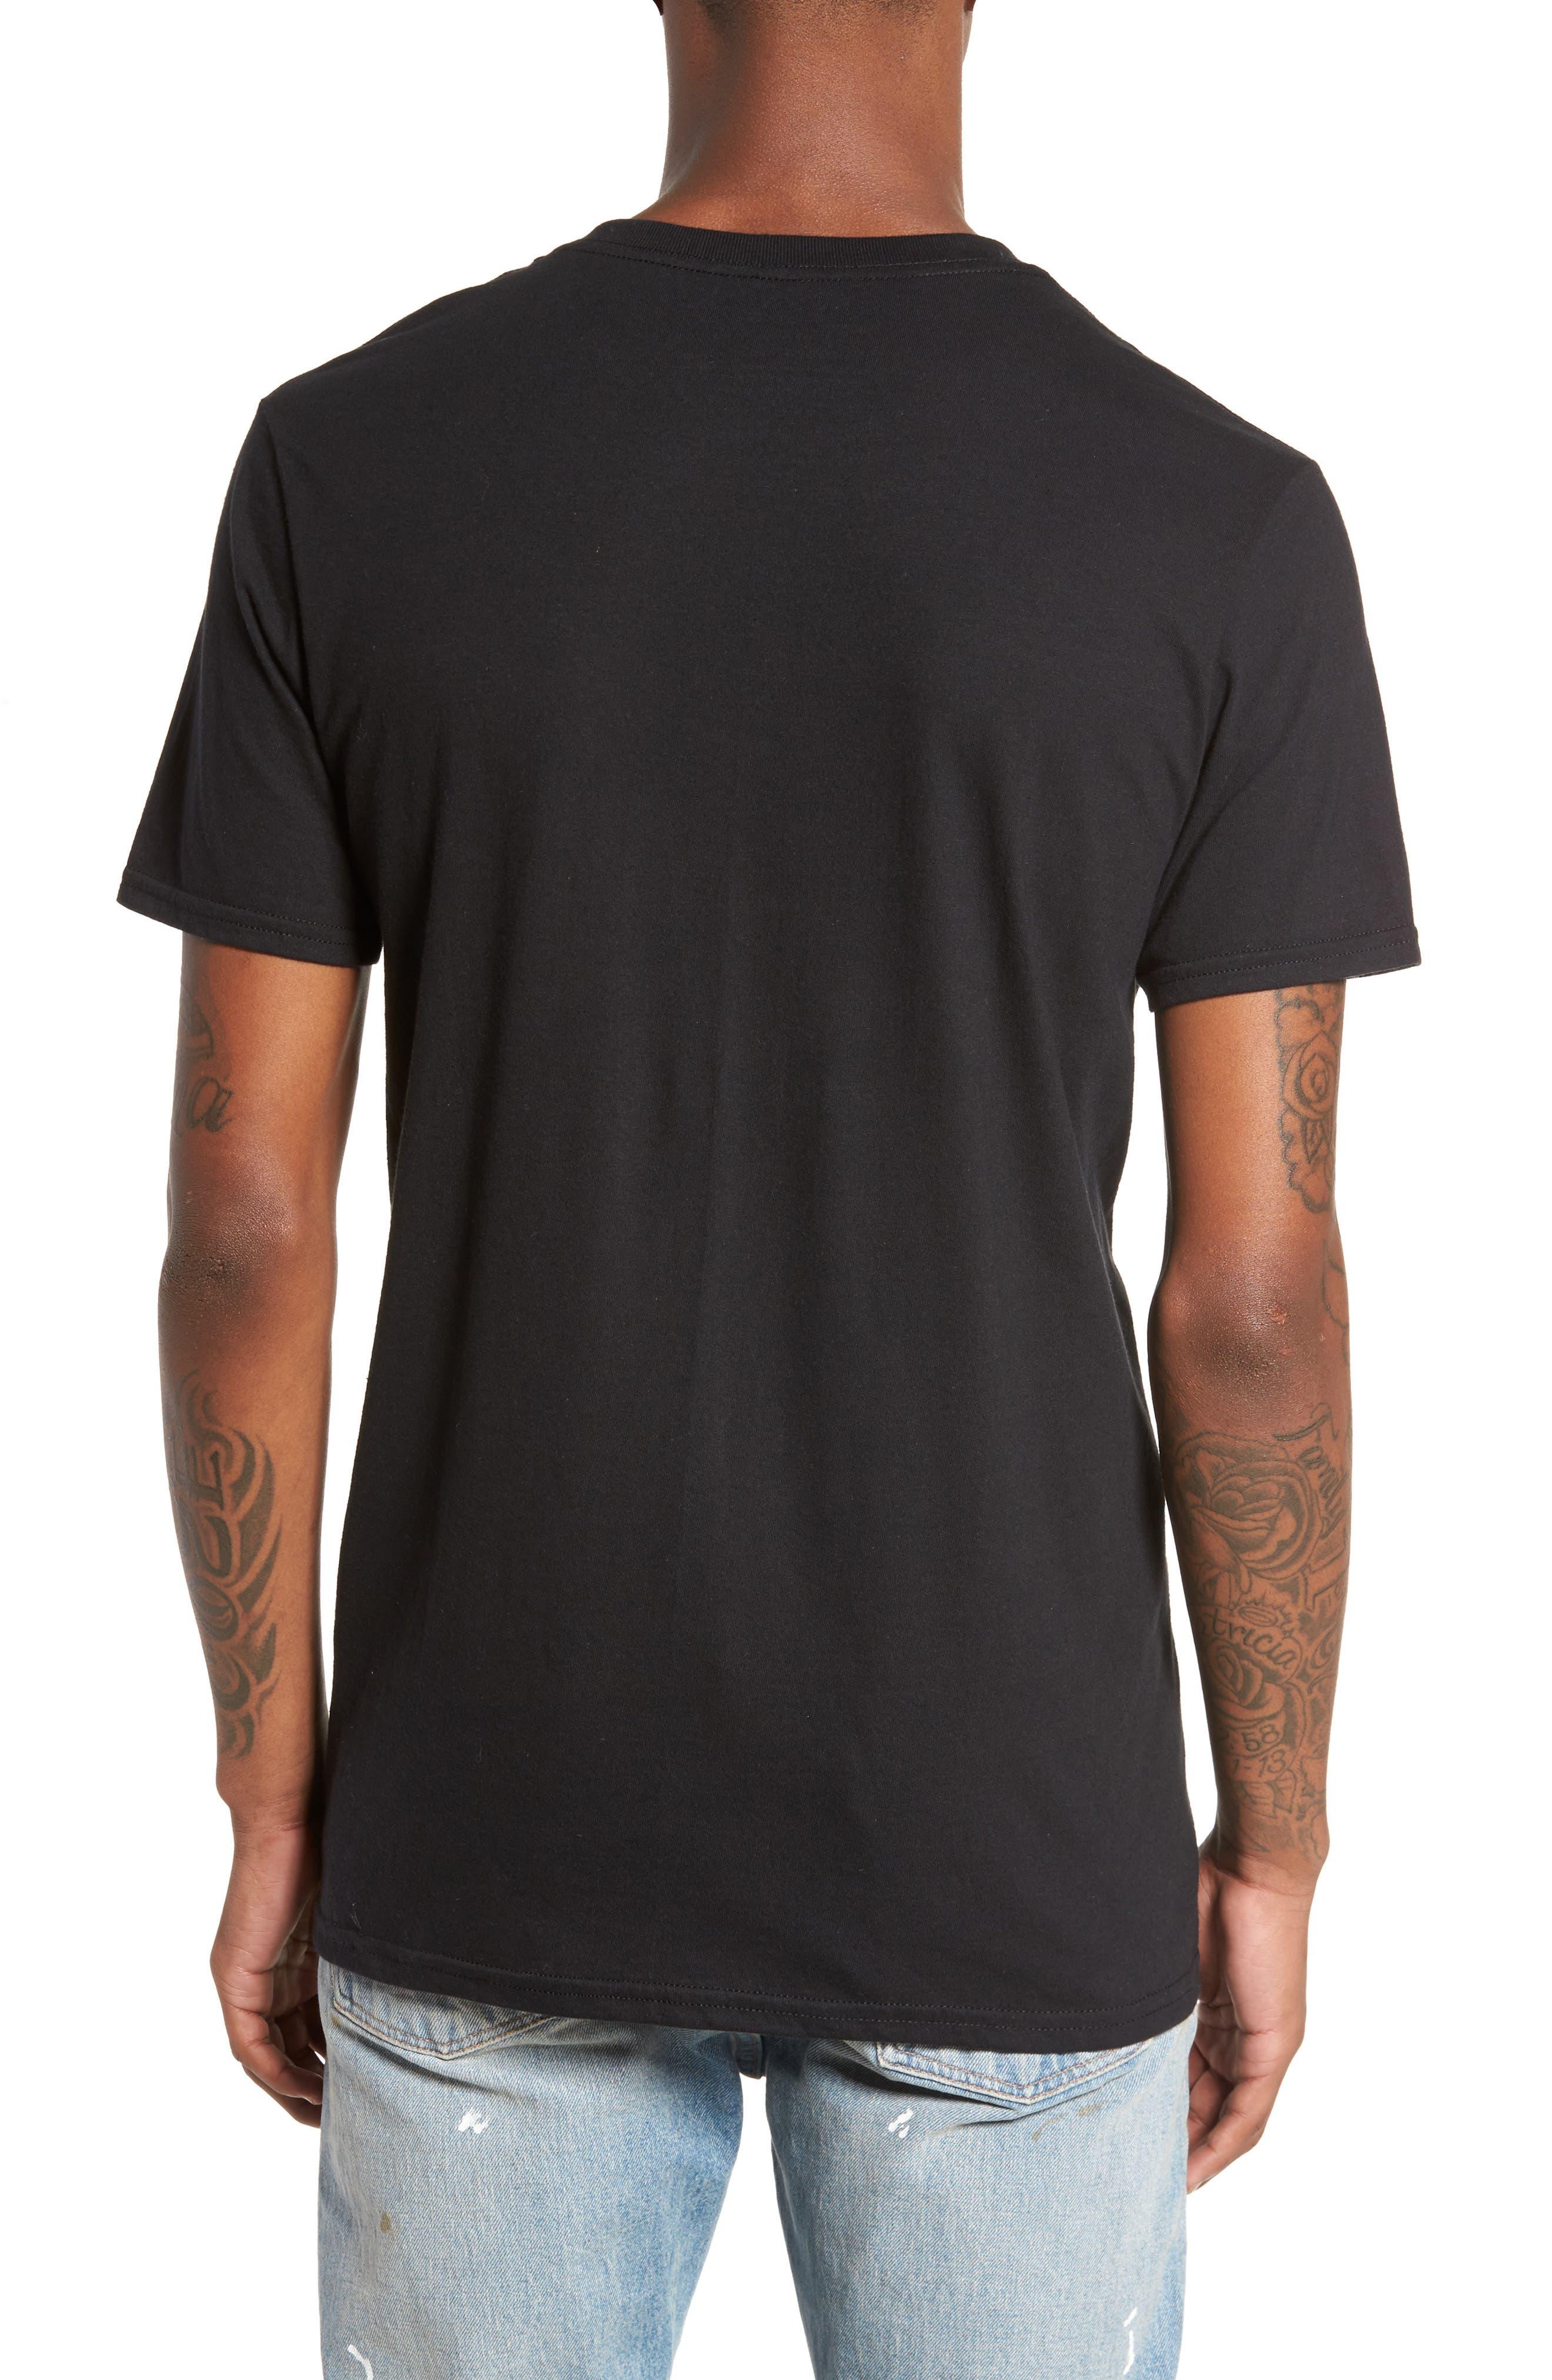 Blessed T-Shirt,                             Alternate thumbnail 2, color,                             Black Blessed